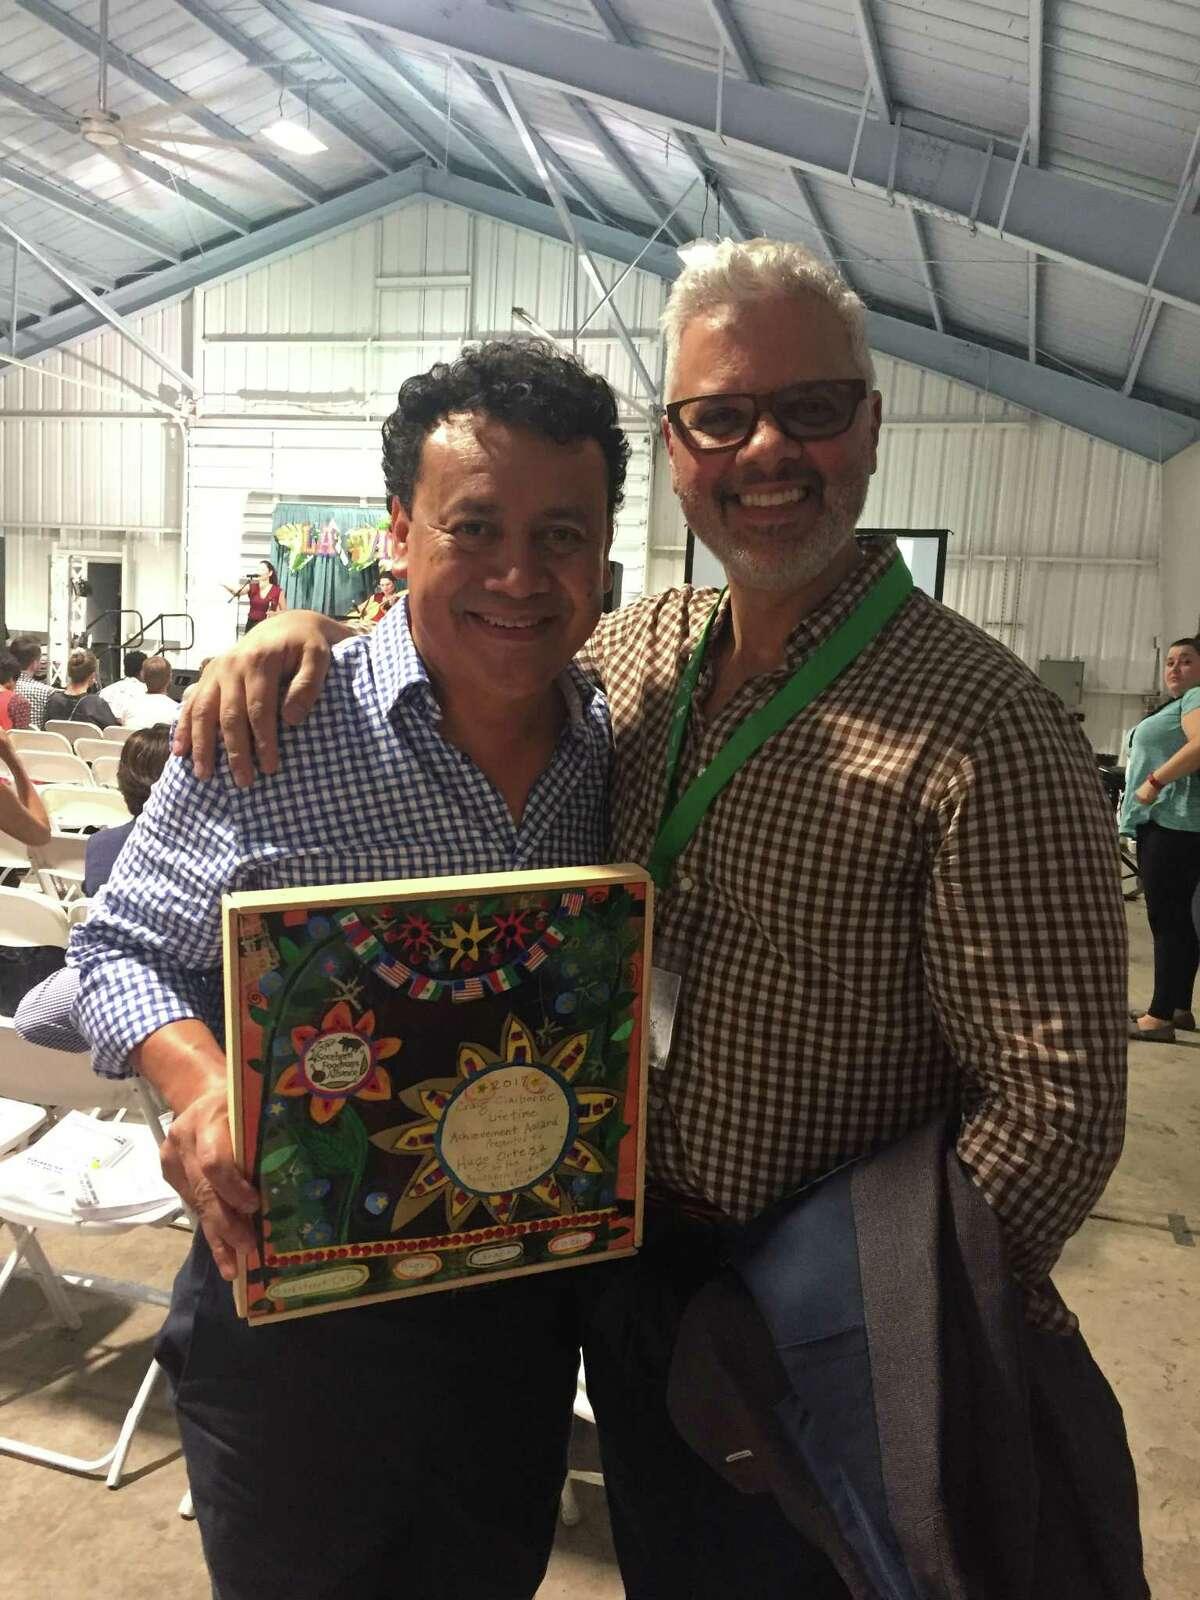 Chef Hugo Ortega with Washington Post food and travel editor Joe Yonan at the 2017 Southern Foodways Alliance symposium. The SFA presented Ortega with the 2017 Craig Claiborne Lifetime Achievement Award.